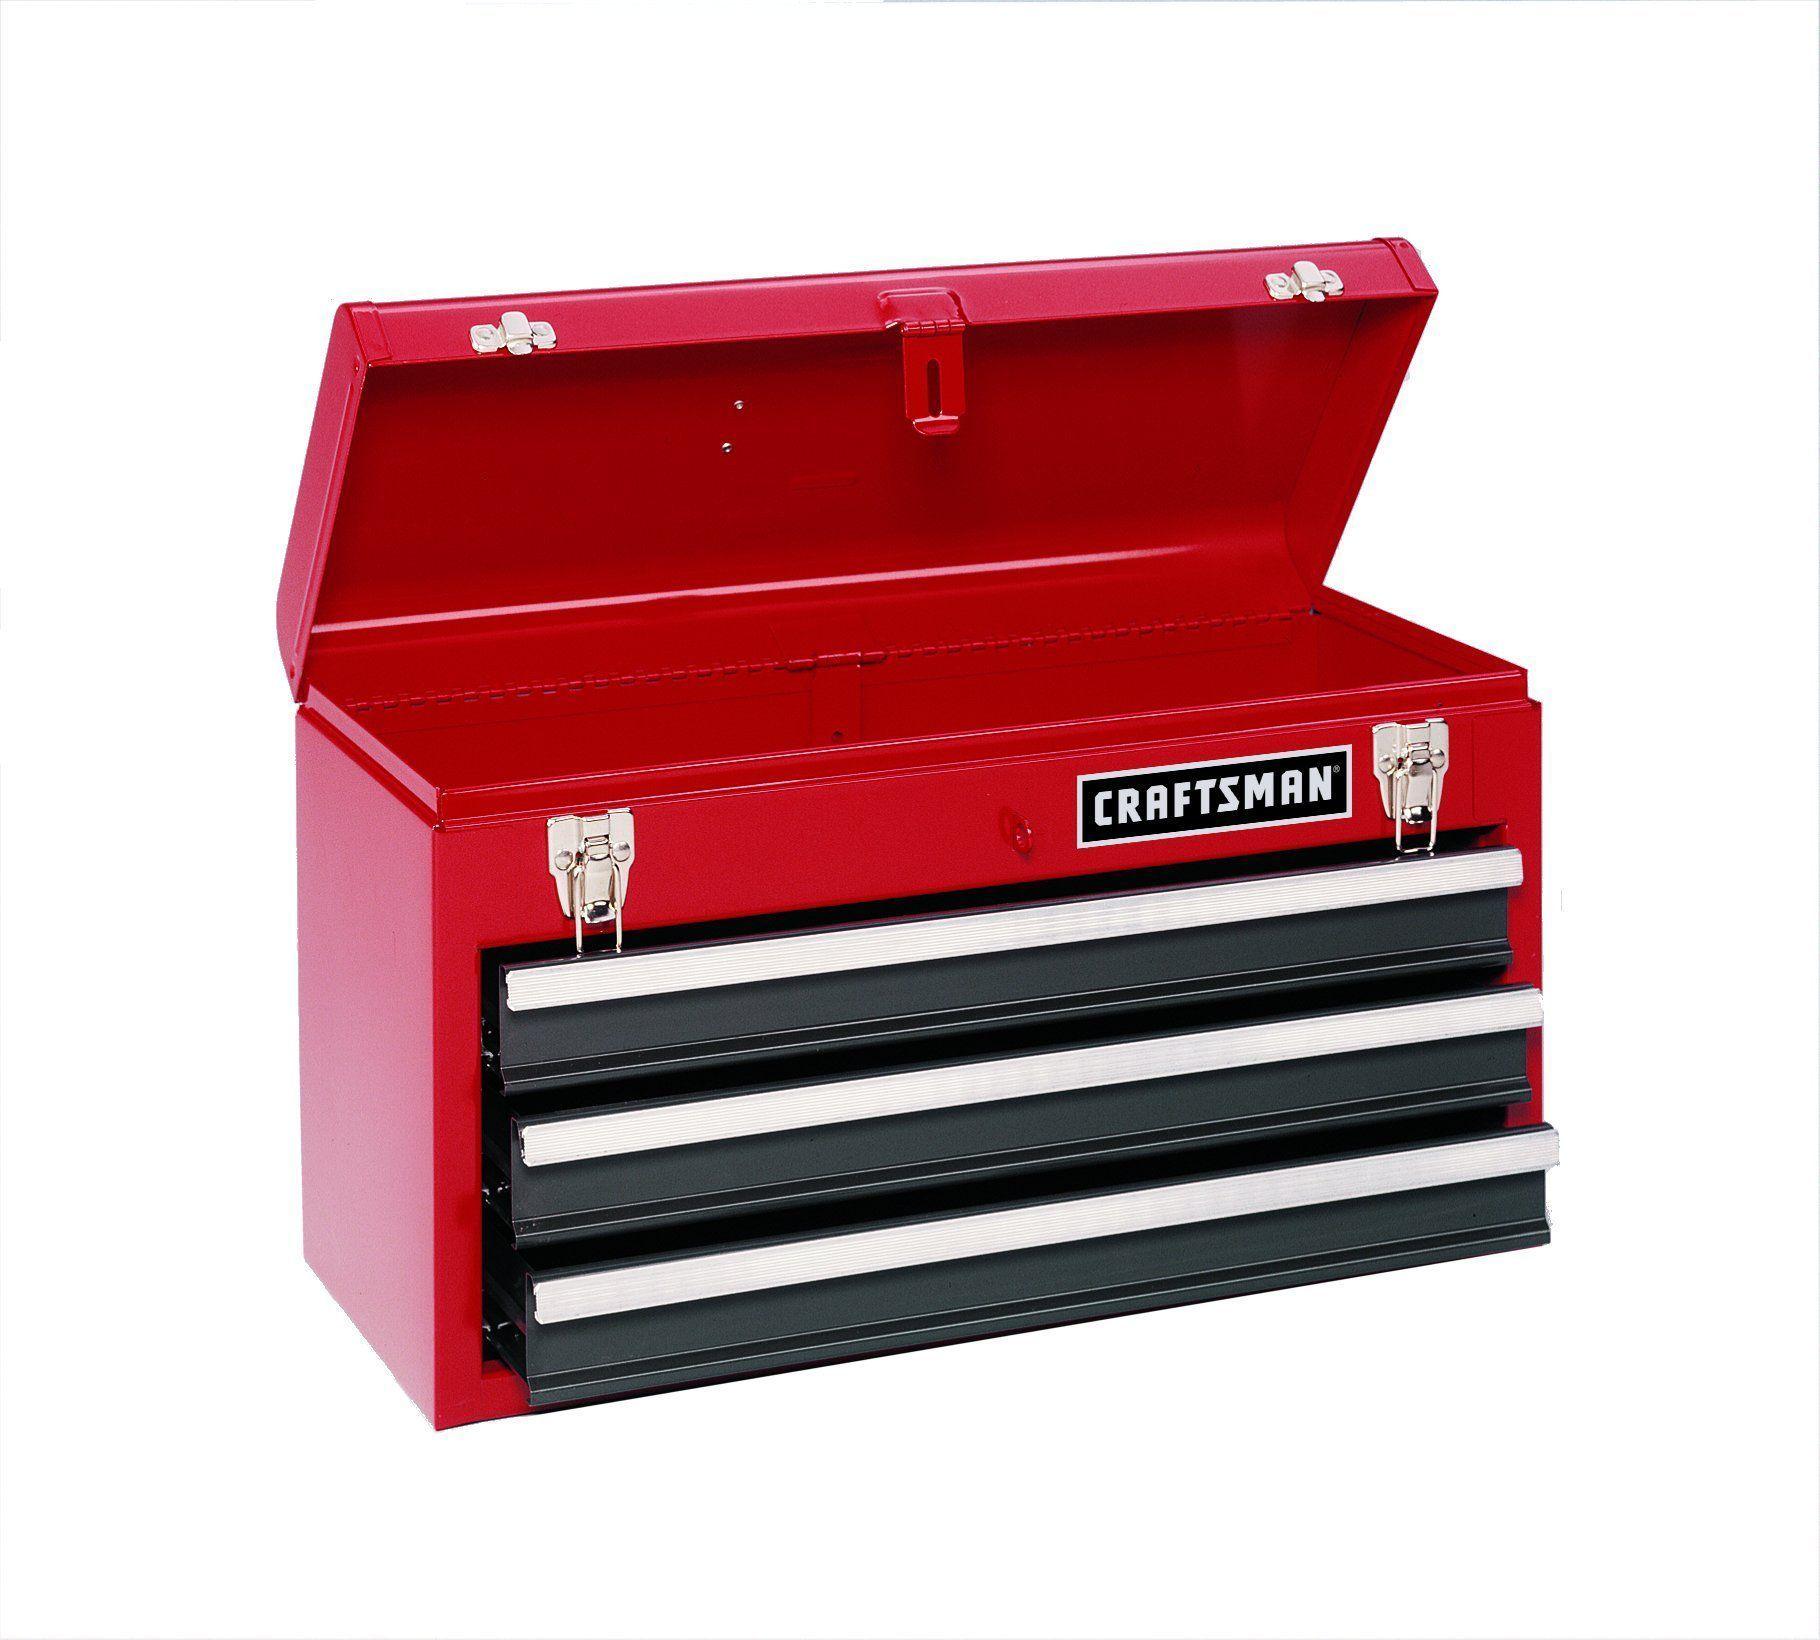 Craftsman Tool Box For Kitchen Gadget Storage On My Wish